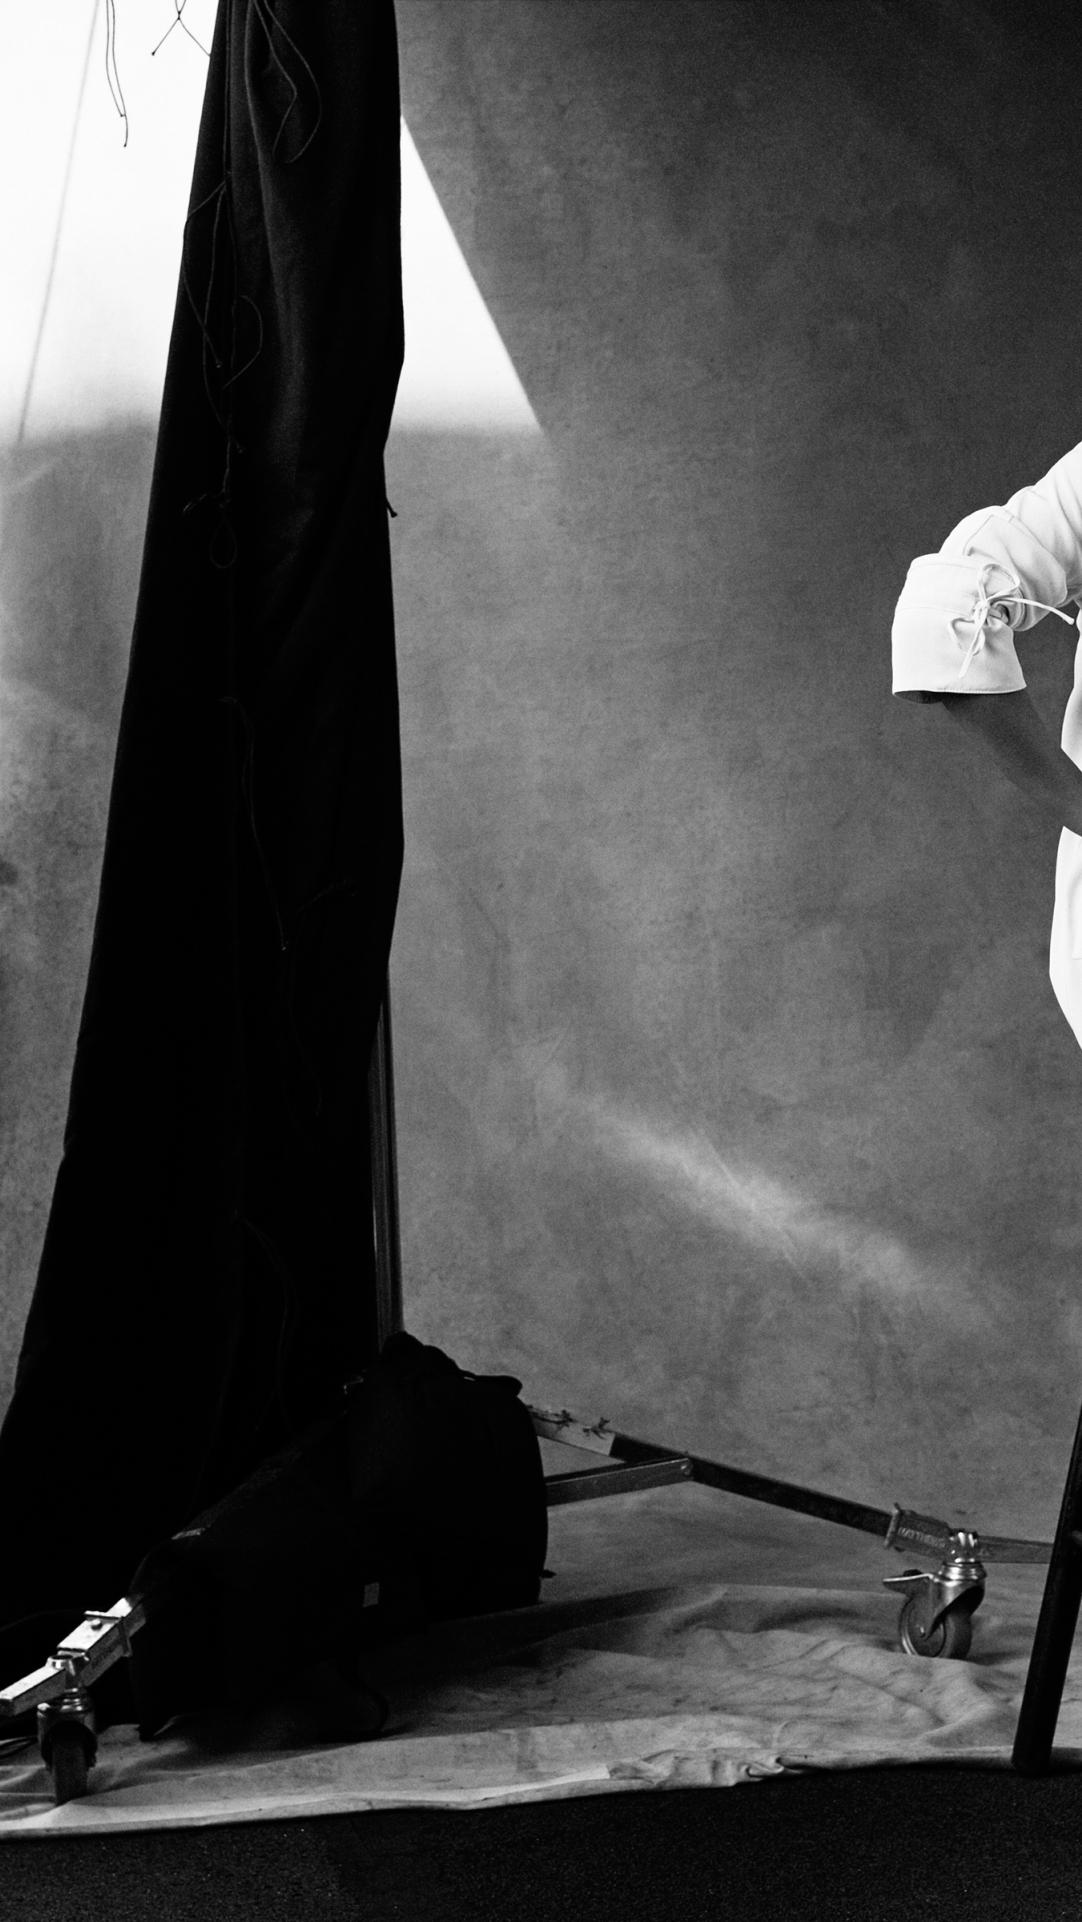 Kate Upton Black And White Photoshoot Hd 4k Wallpaper